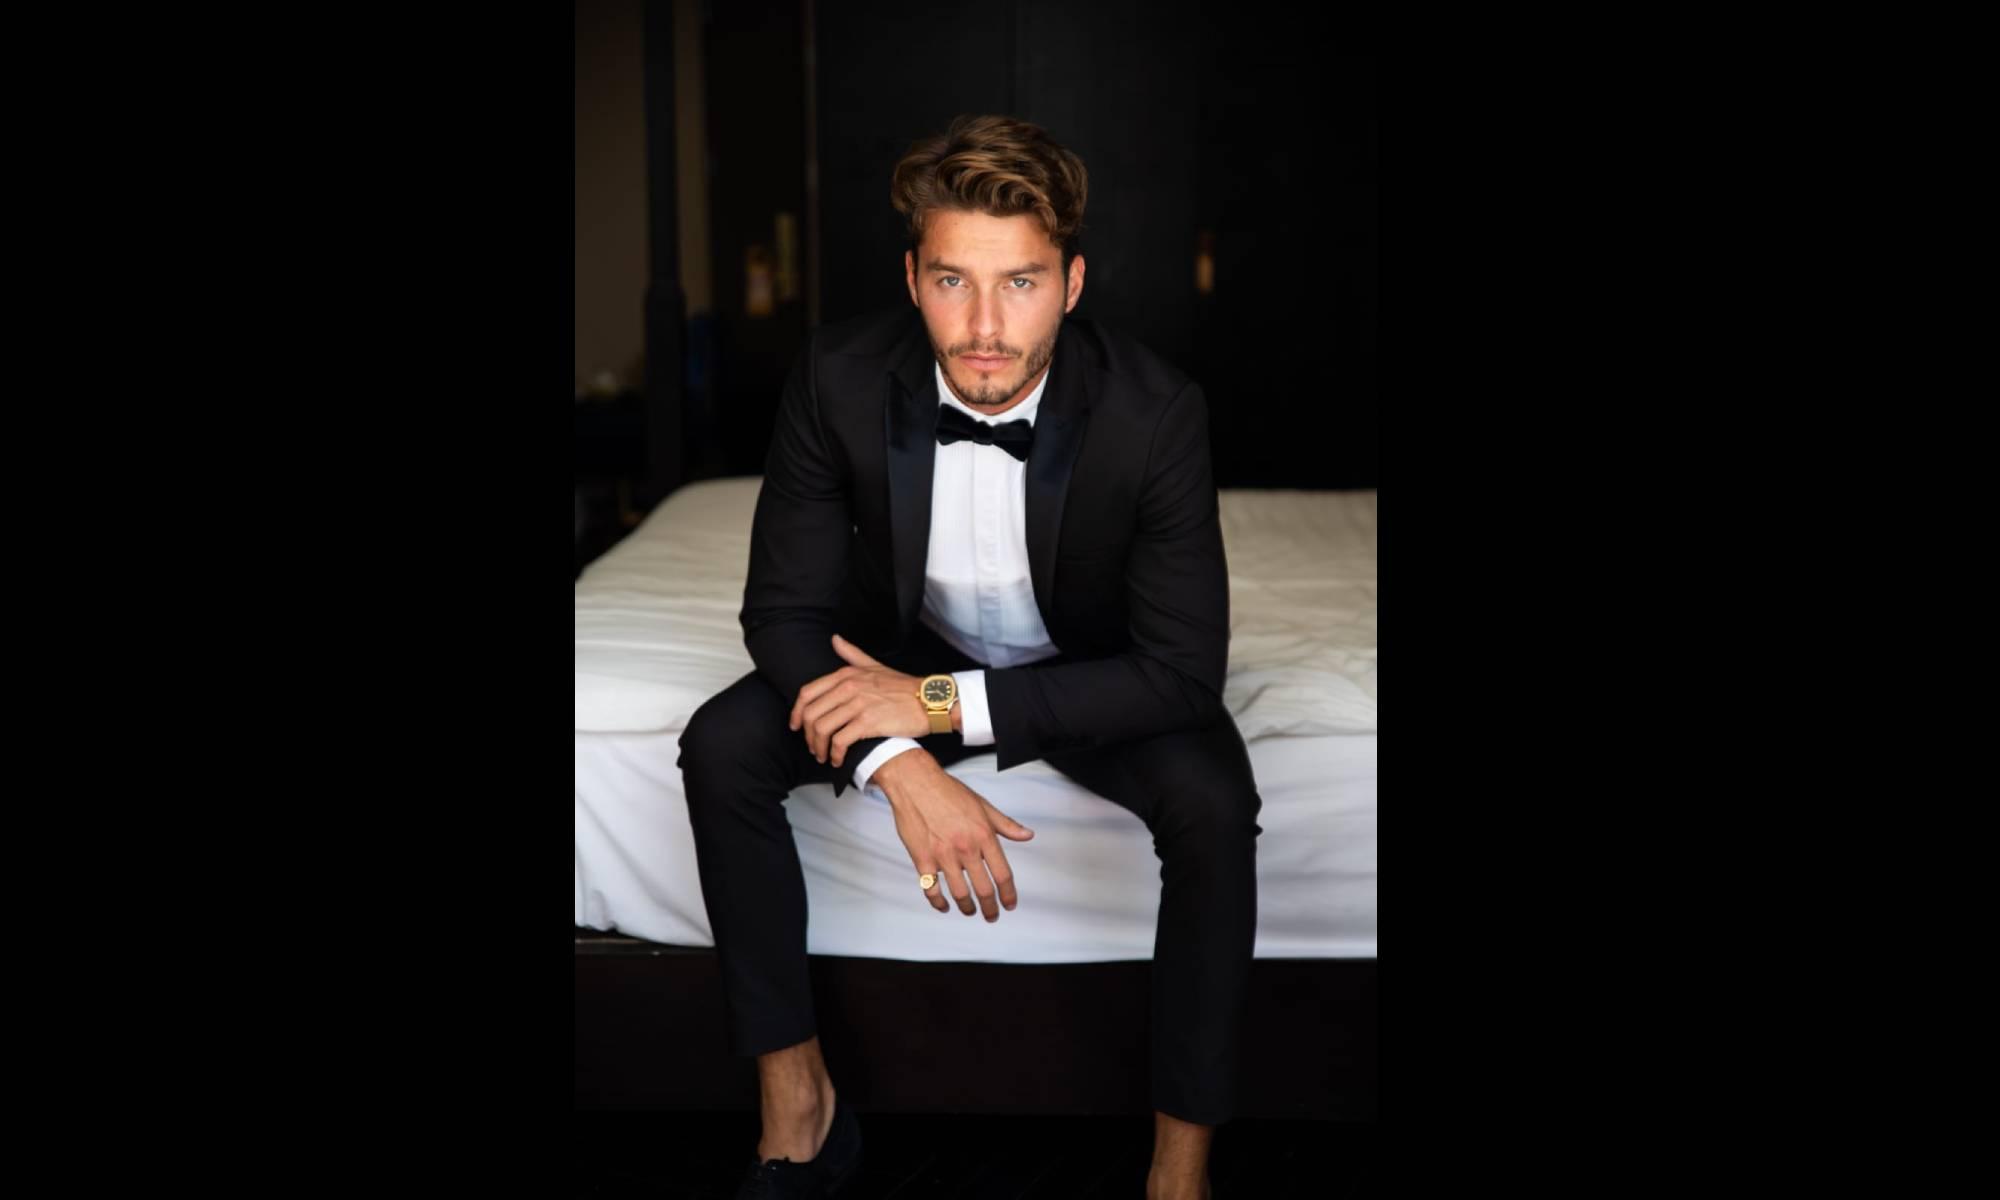 BONO חליפות חתן | חליפות בר מצווה | חליפות לגברים |חליפות נשף סיום